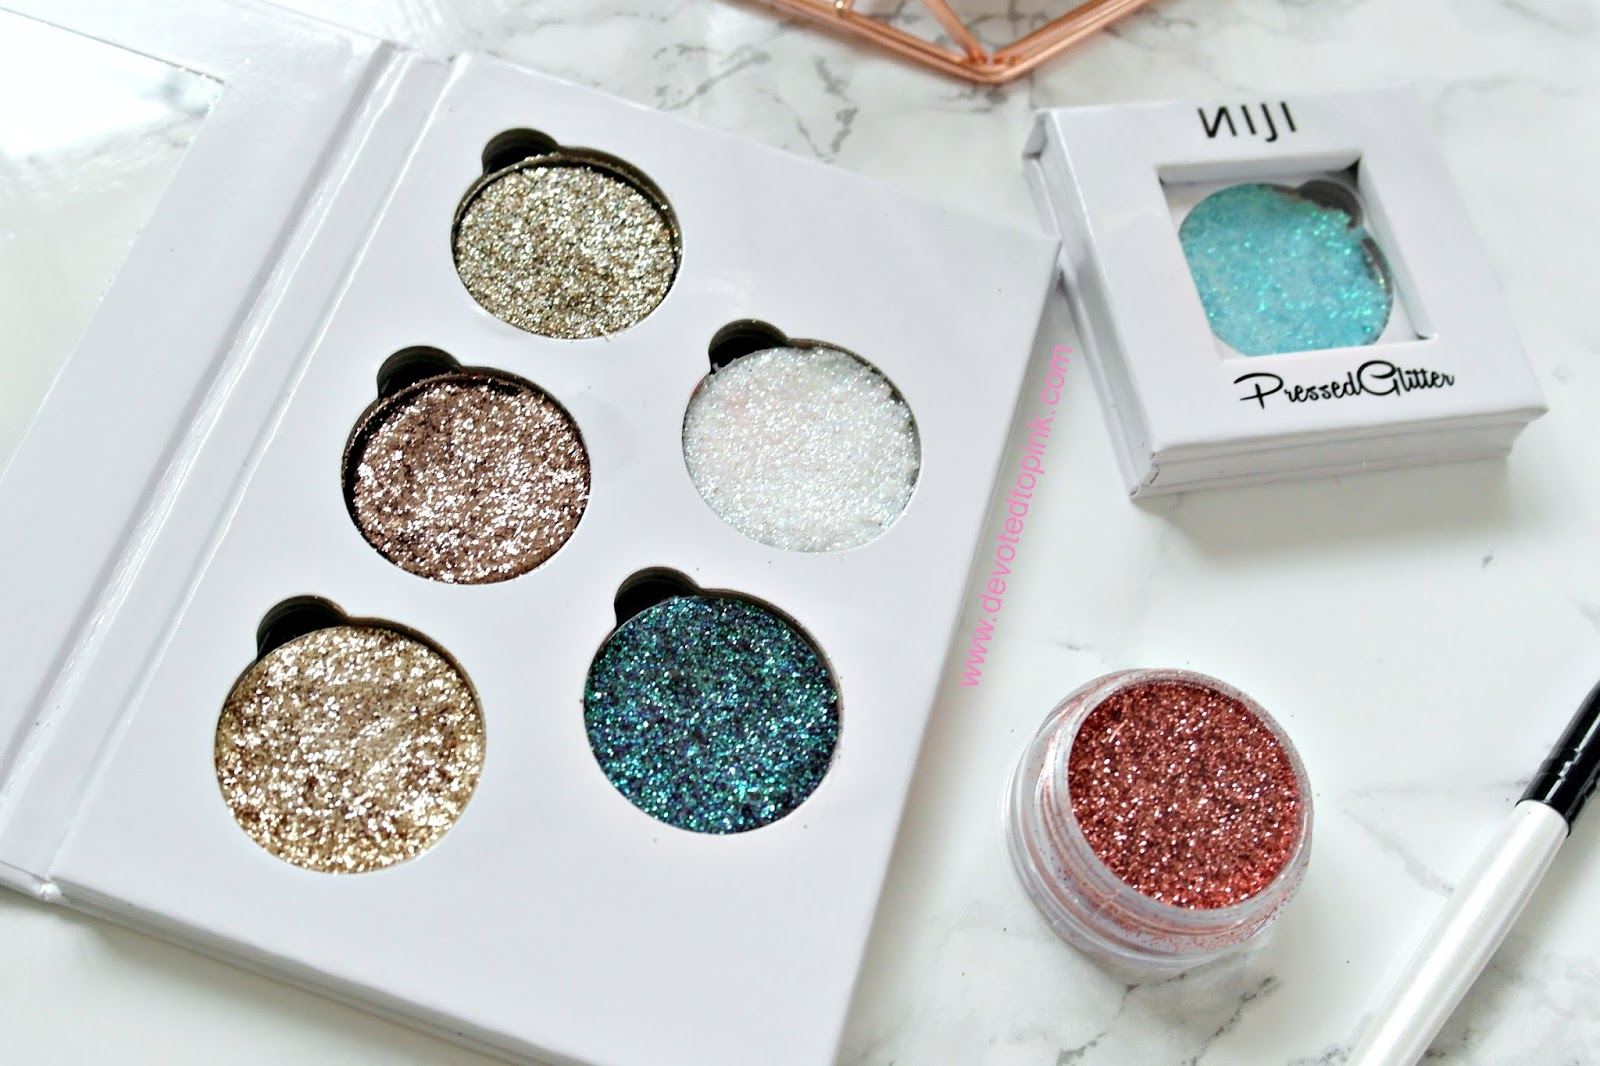 glittereyes, niji cosmetics, glitter, review, glitter lovers, glitter eyeshadow, glitter eyes